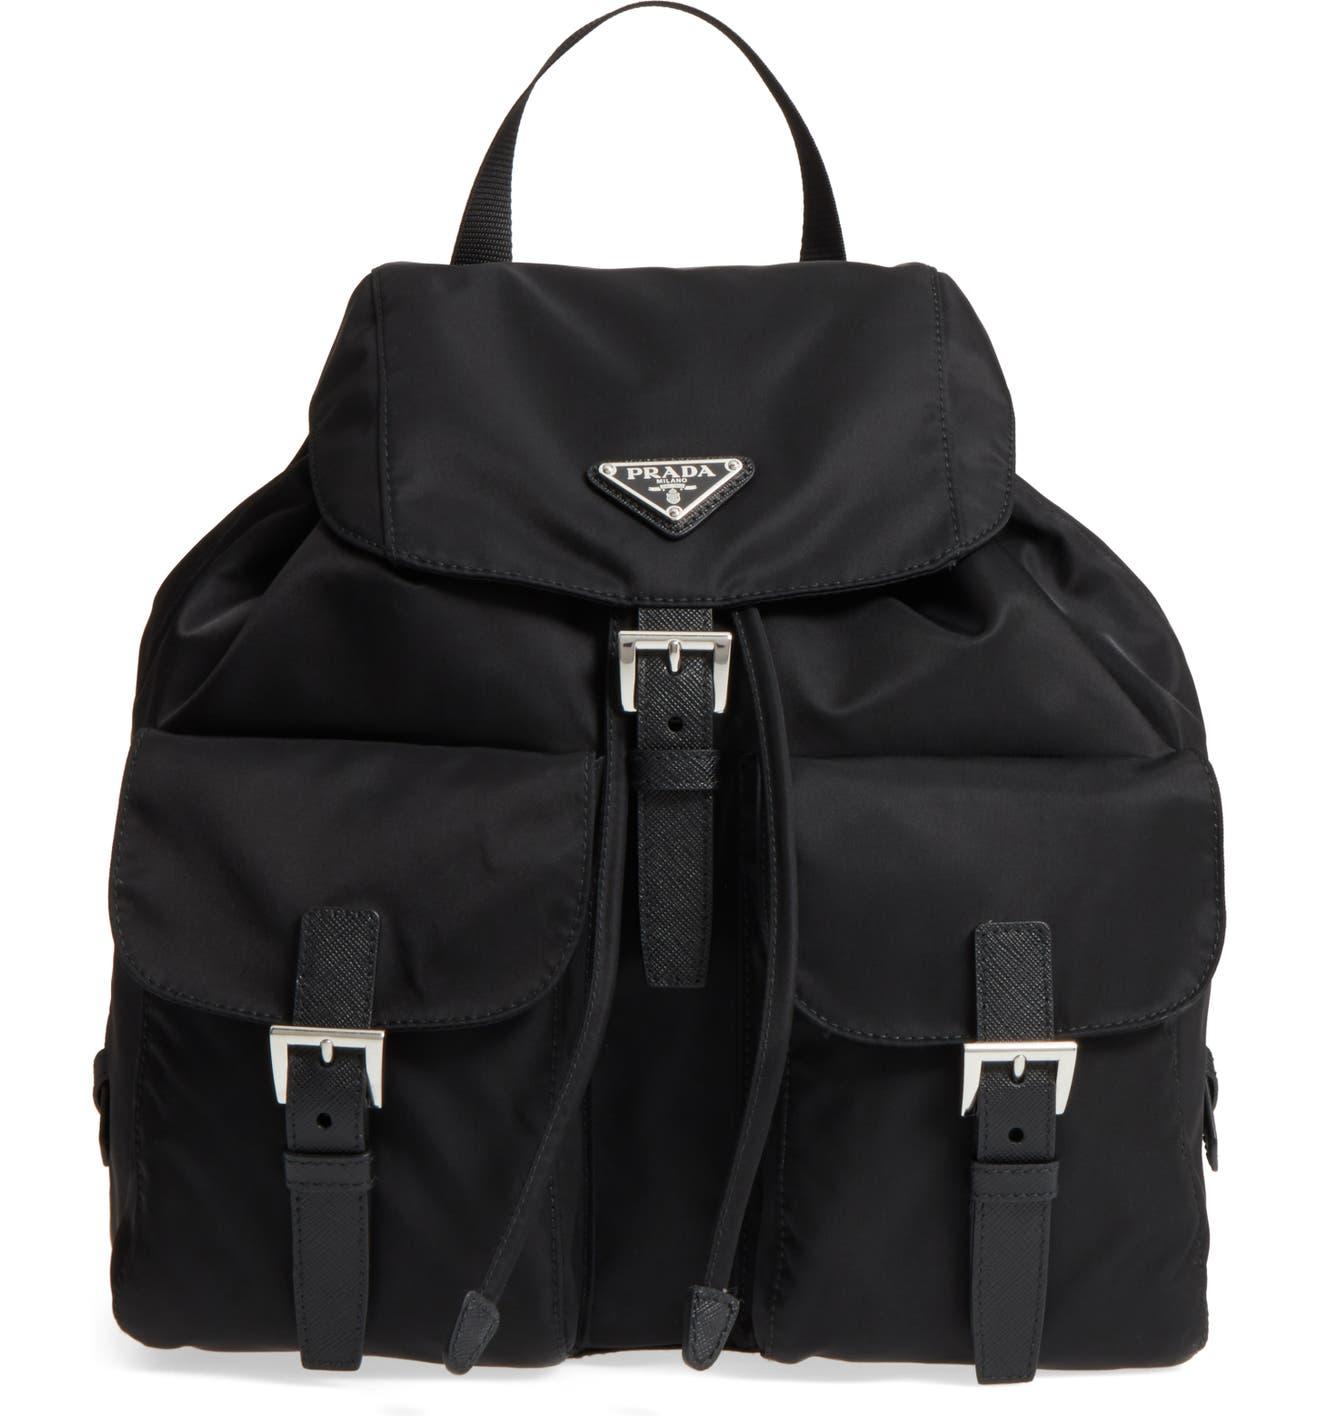 7e748b3f50fffc Prada Large Nylon Backpack | Nordstrom